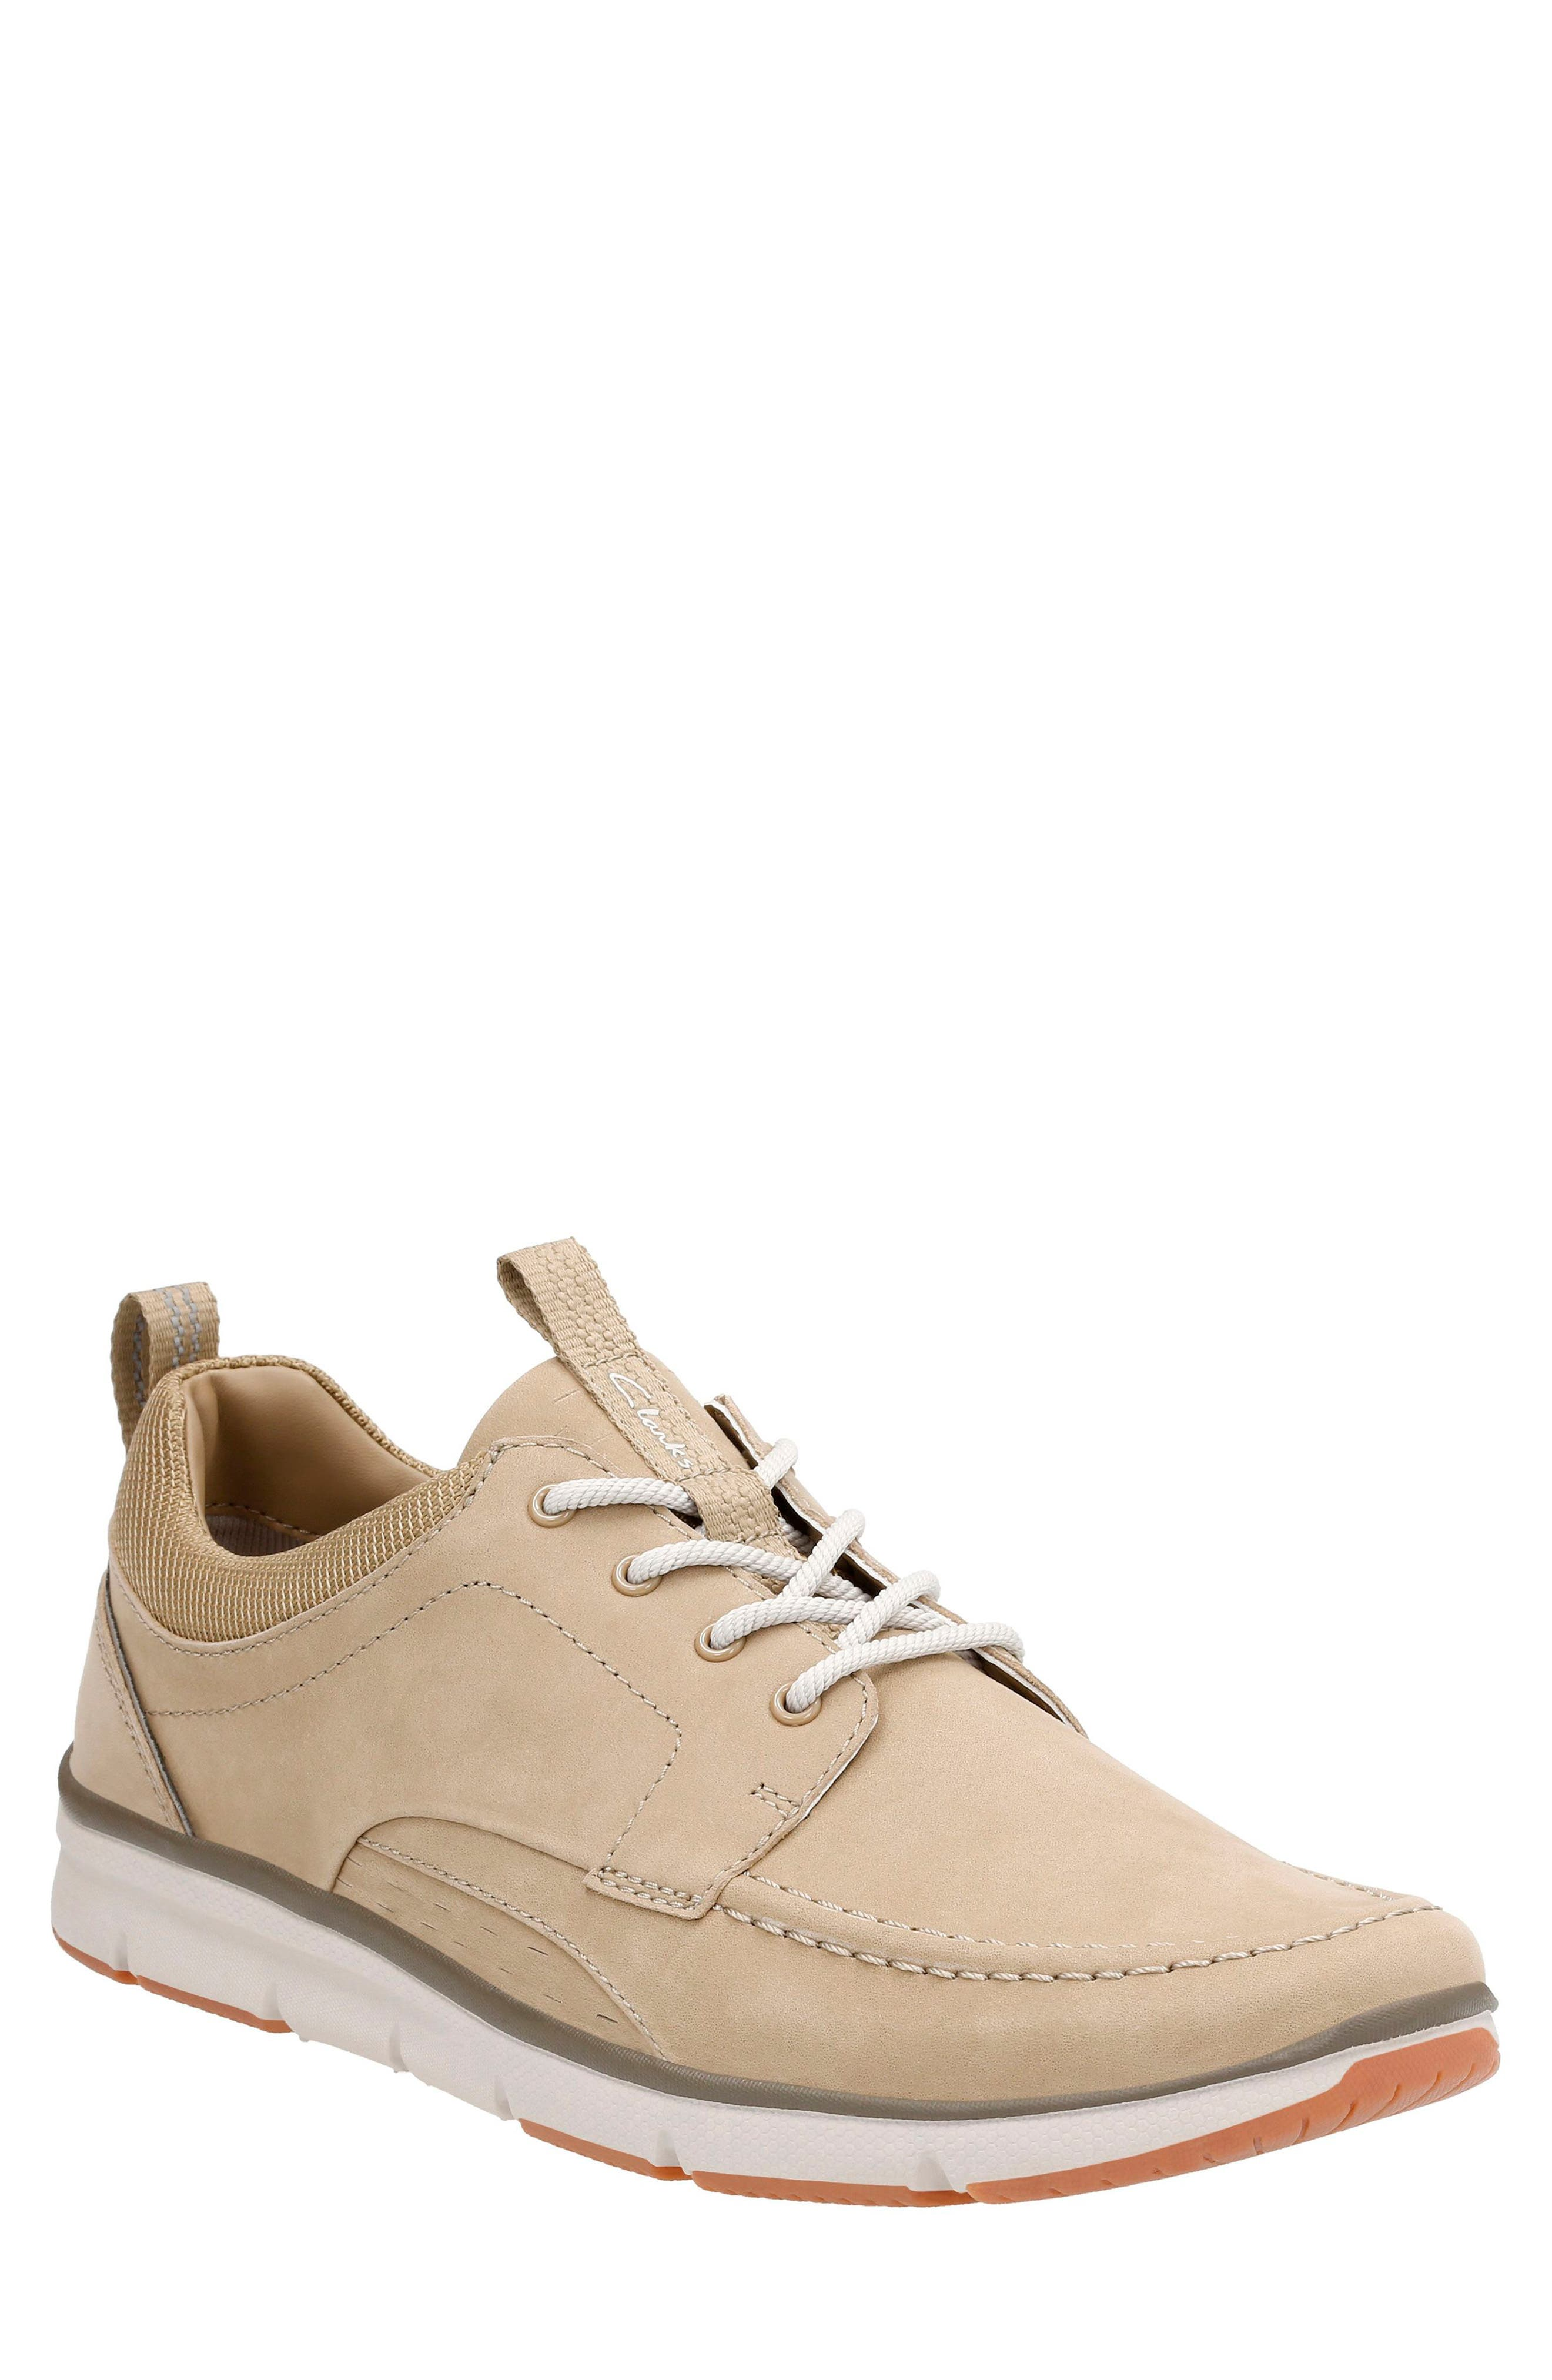 Orson Bay Sneaker,                             Main thumbnail 1, color,                             200